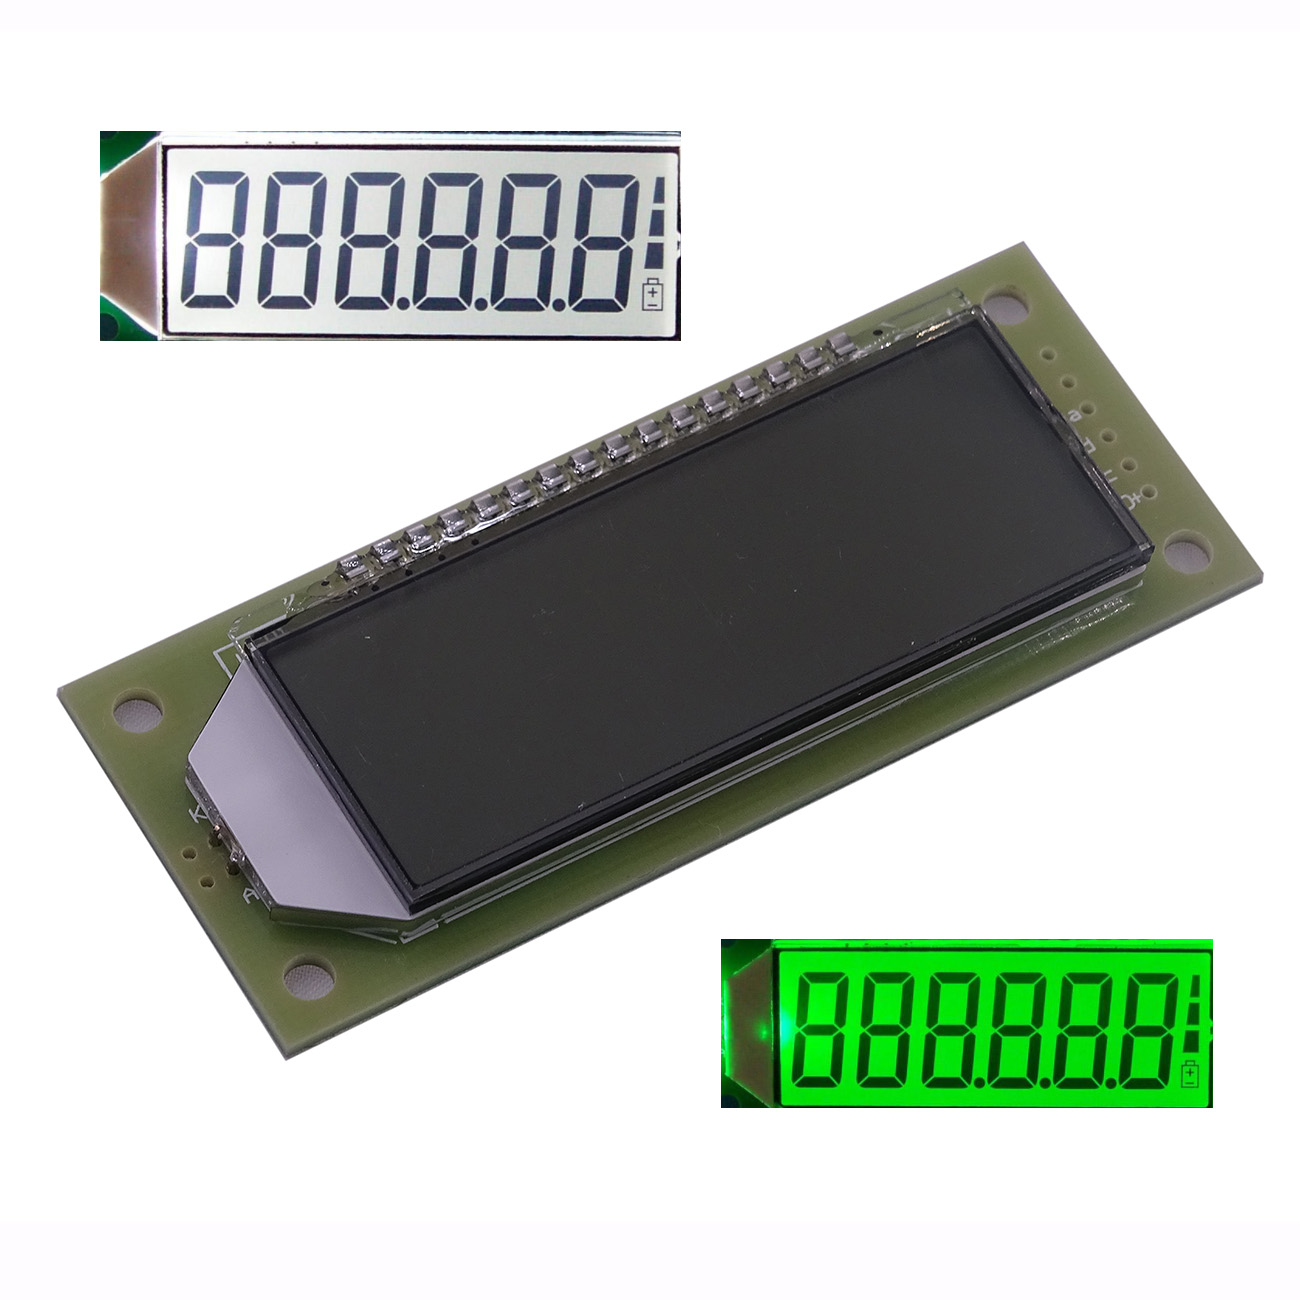 Komma Weiß/grün Hintergrundbeleuchtung Hell Und Durchscheinend Im Aussehen Lcd Module Zielstrebig Lcd Modul 2,4-zoll 6 Bit 7 Segment Lcd Display Modul Ht1621 Lcd Fahrer Ic